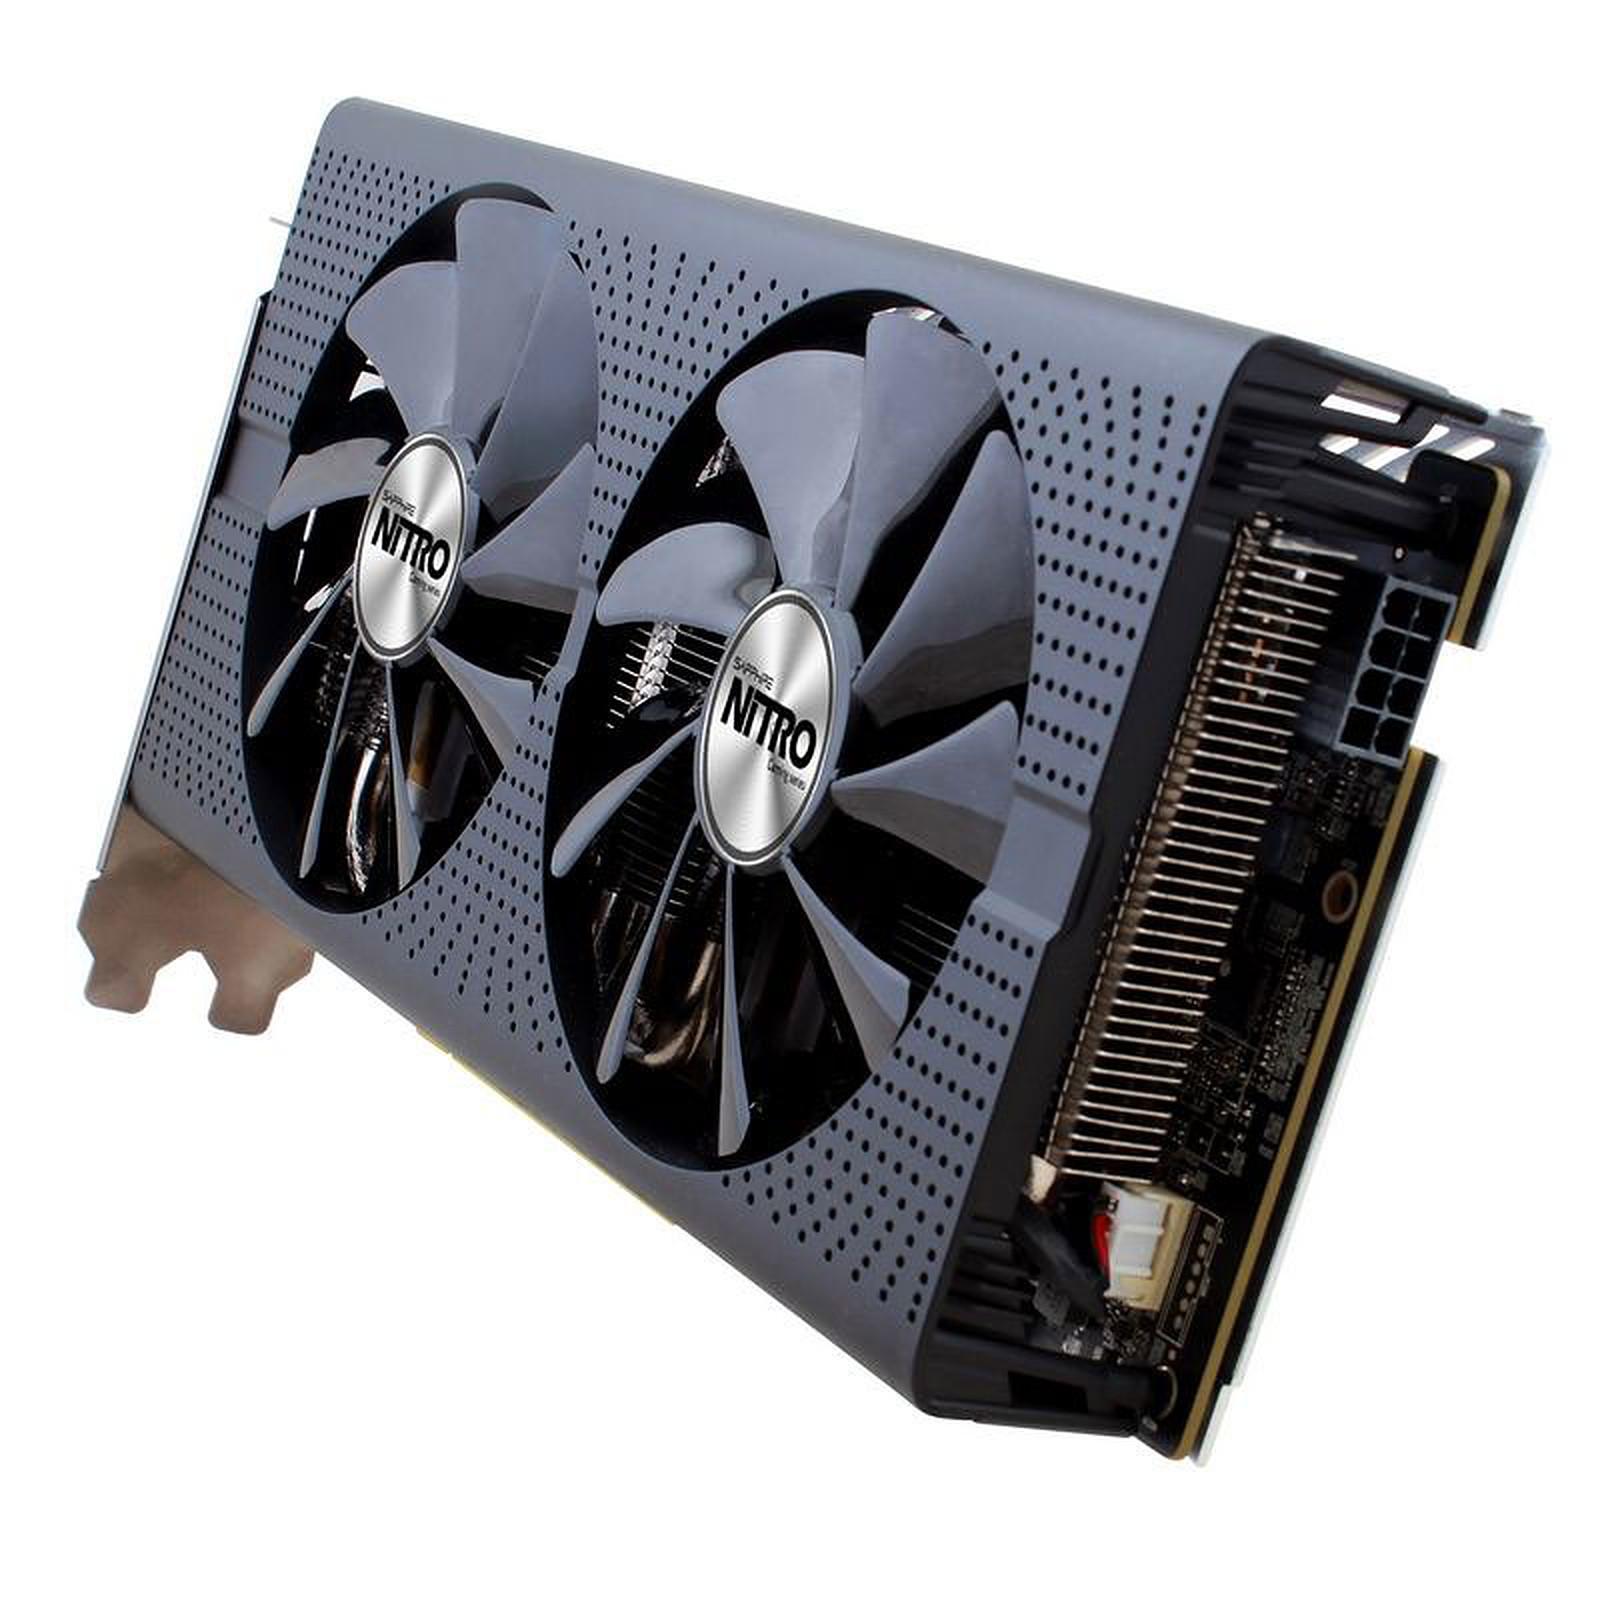 Sapphire Radeon RX 470 8G Mining Edition